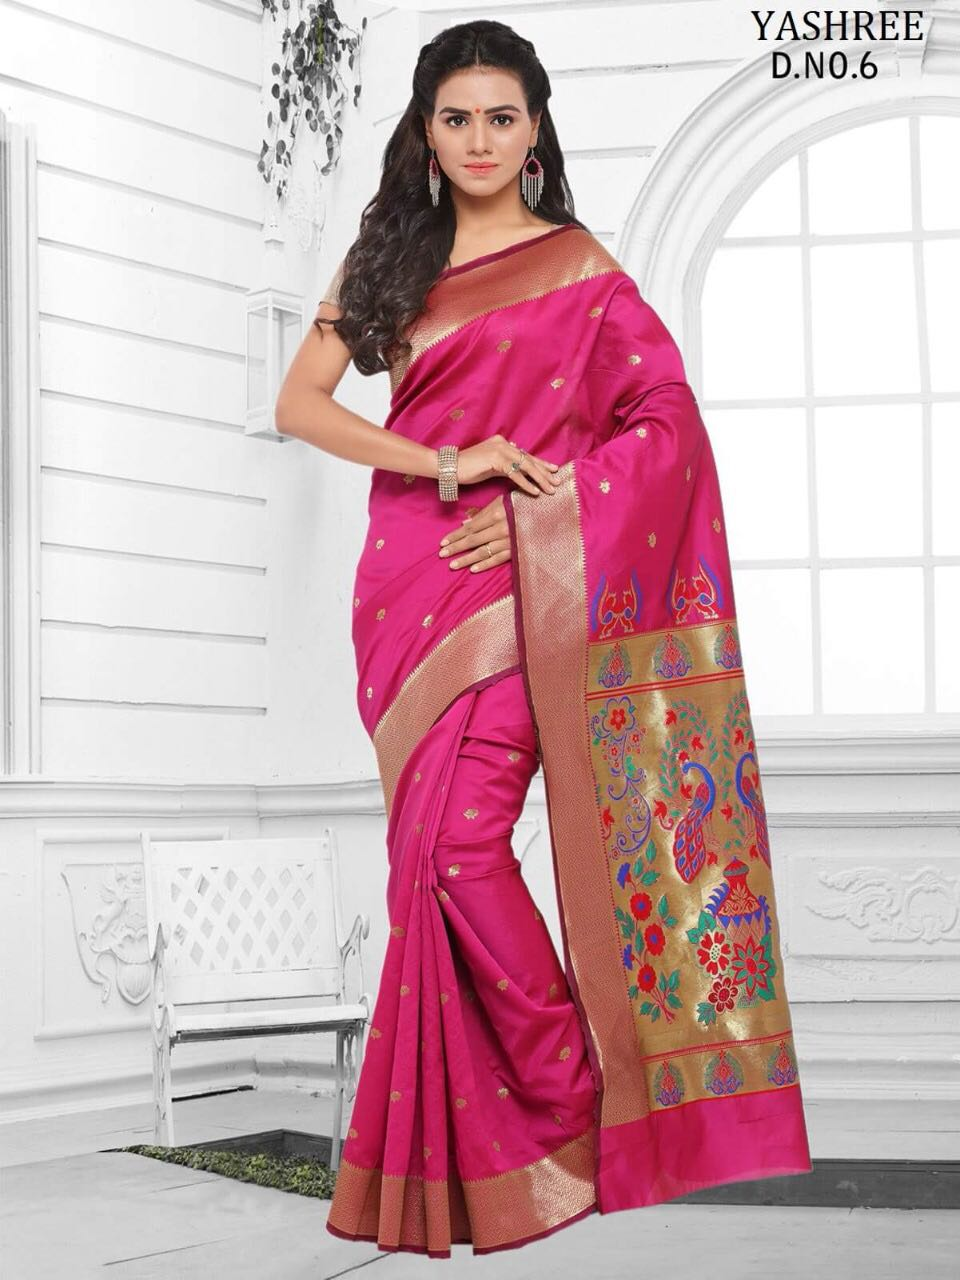 Yadunandan Fashion Yashree 6